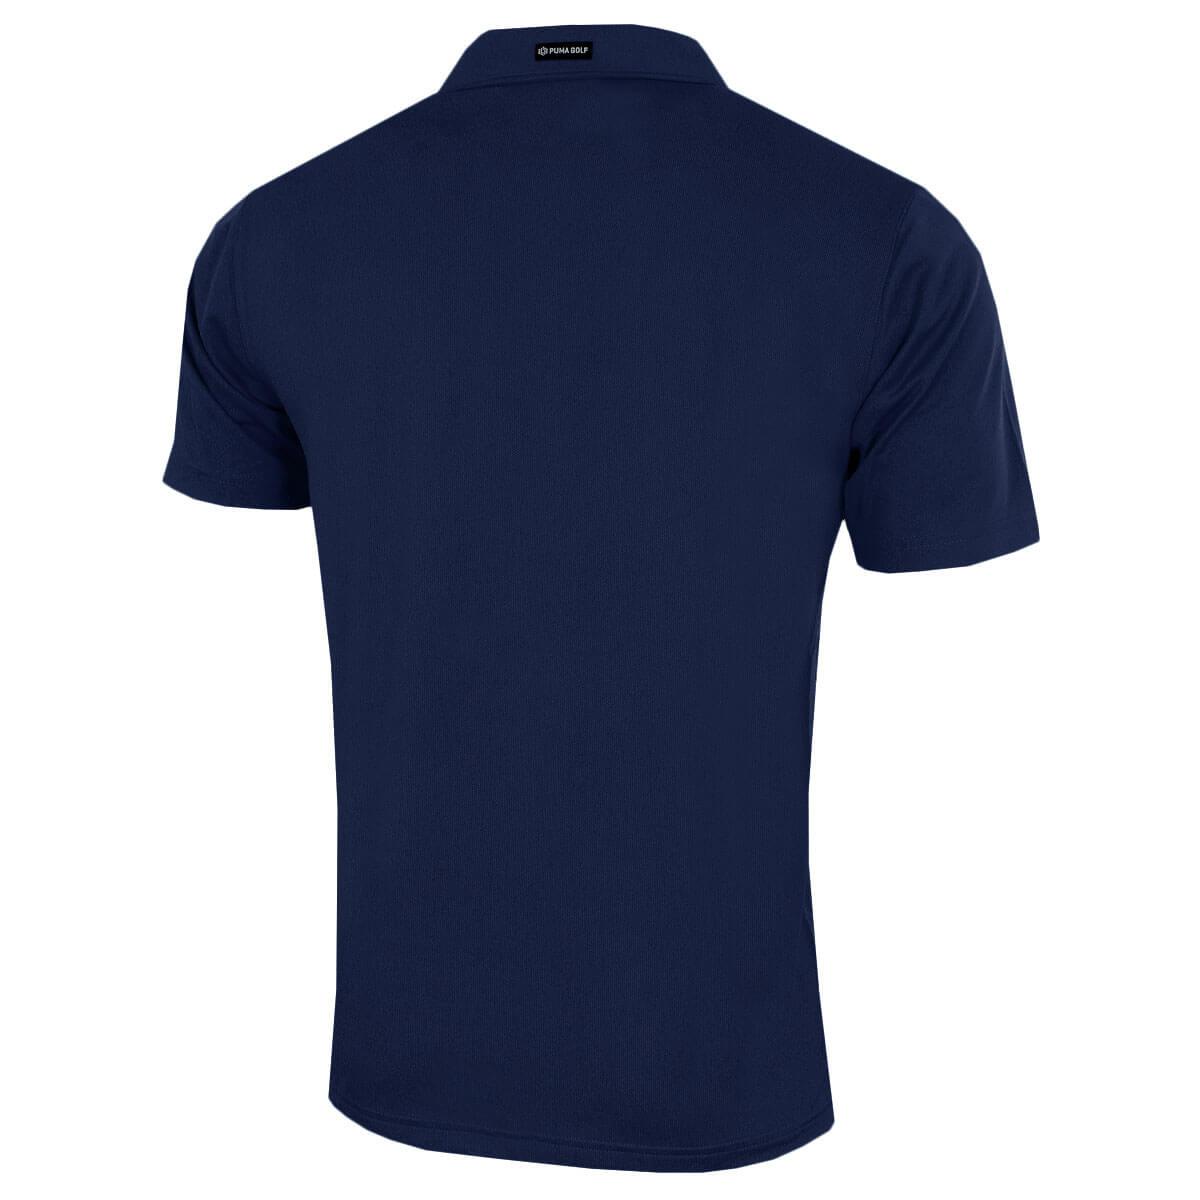 Puma-Golf-Mens-Essential-Pounce-Cresting-DryCell-Tech-Polo-Shirt-46-OFF-RRP thumbnail 23